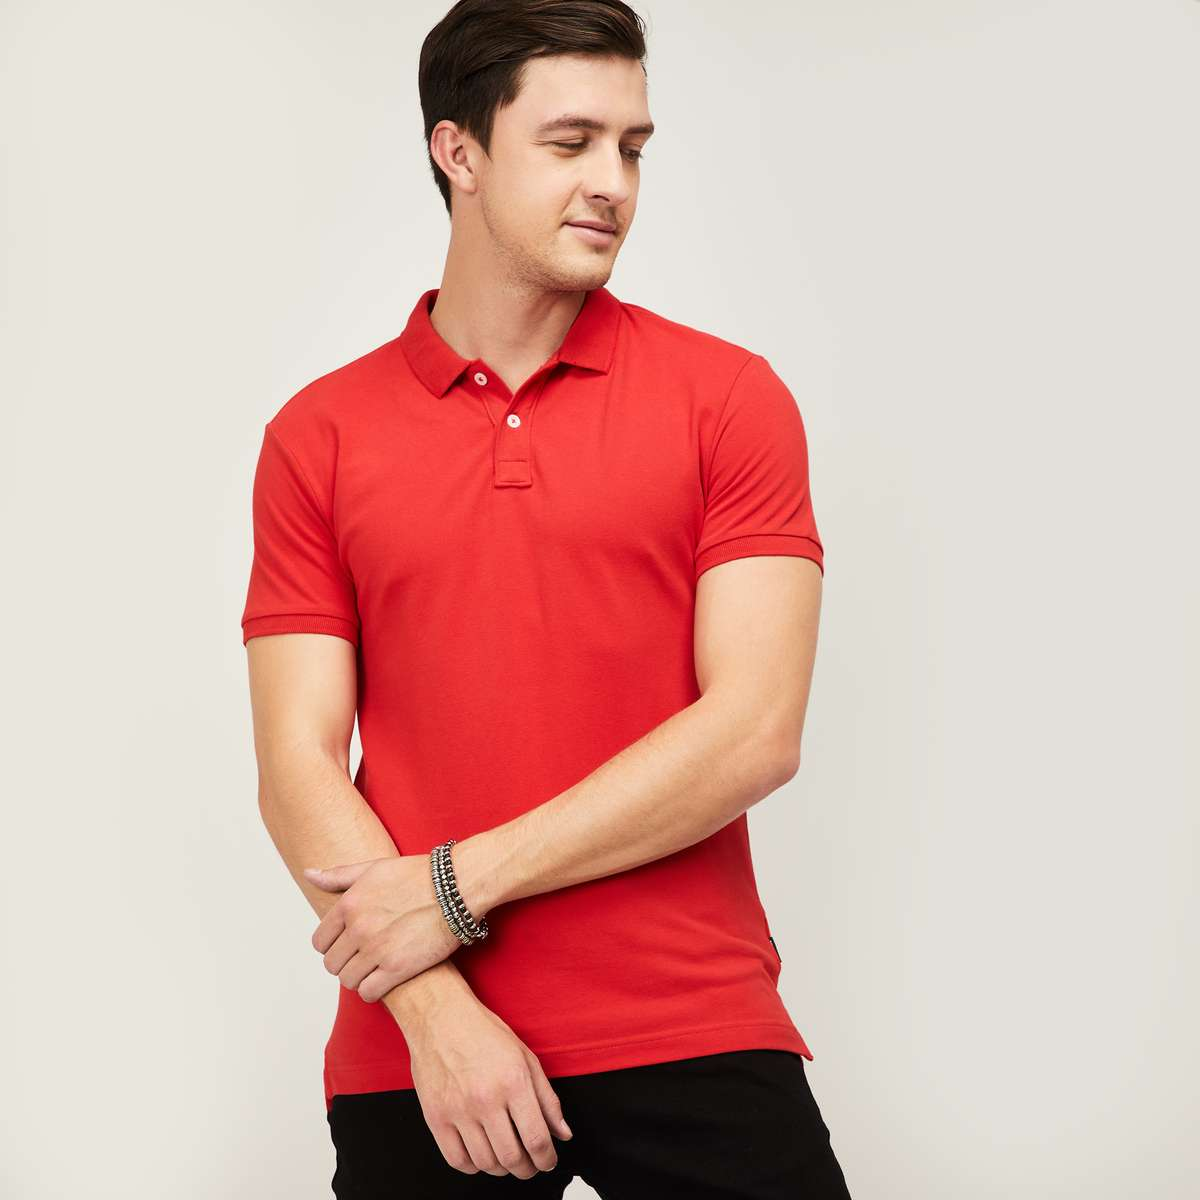 DENIMIZE Men Solid Regular Fit Polo T-shirt